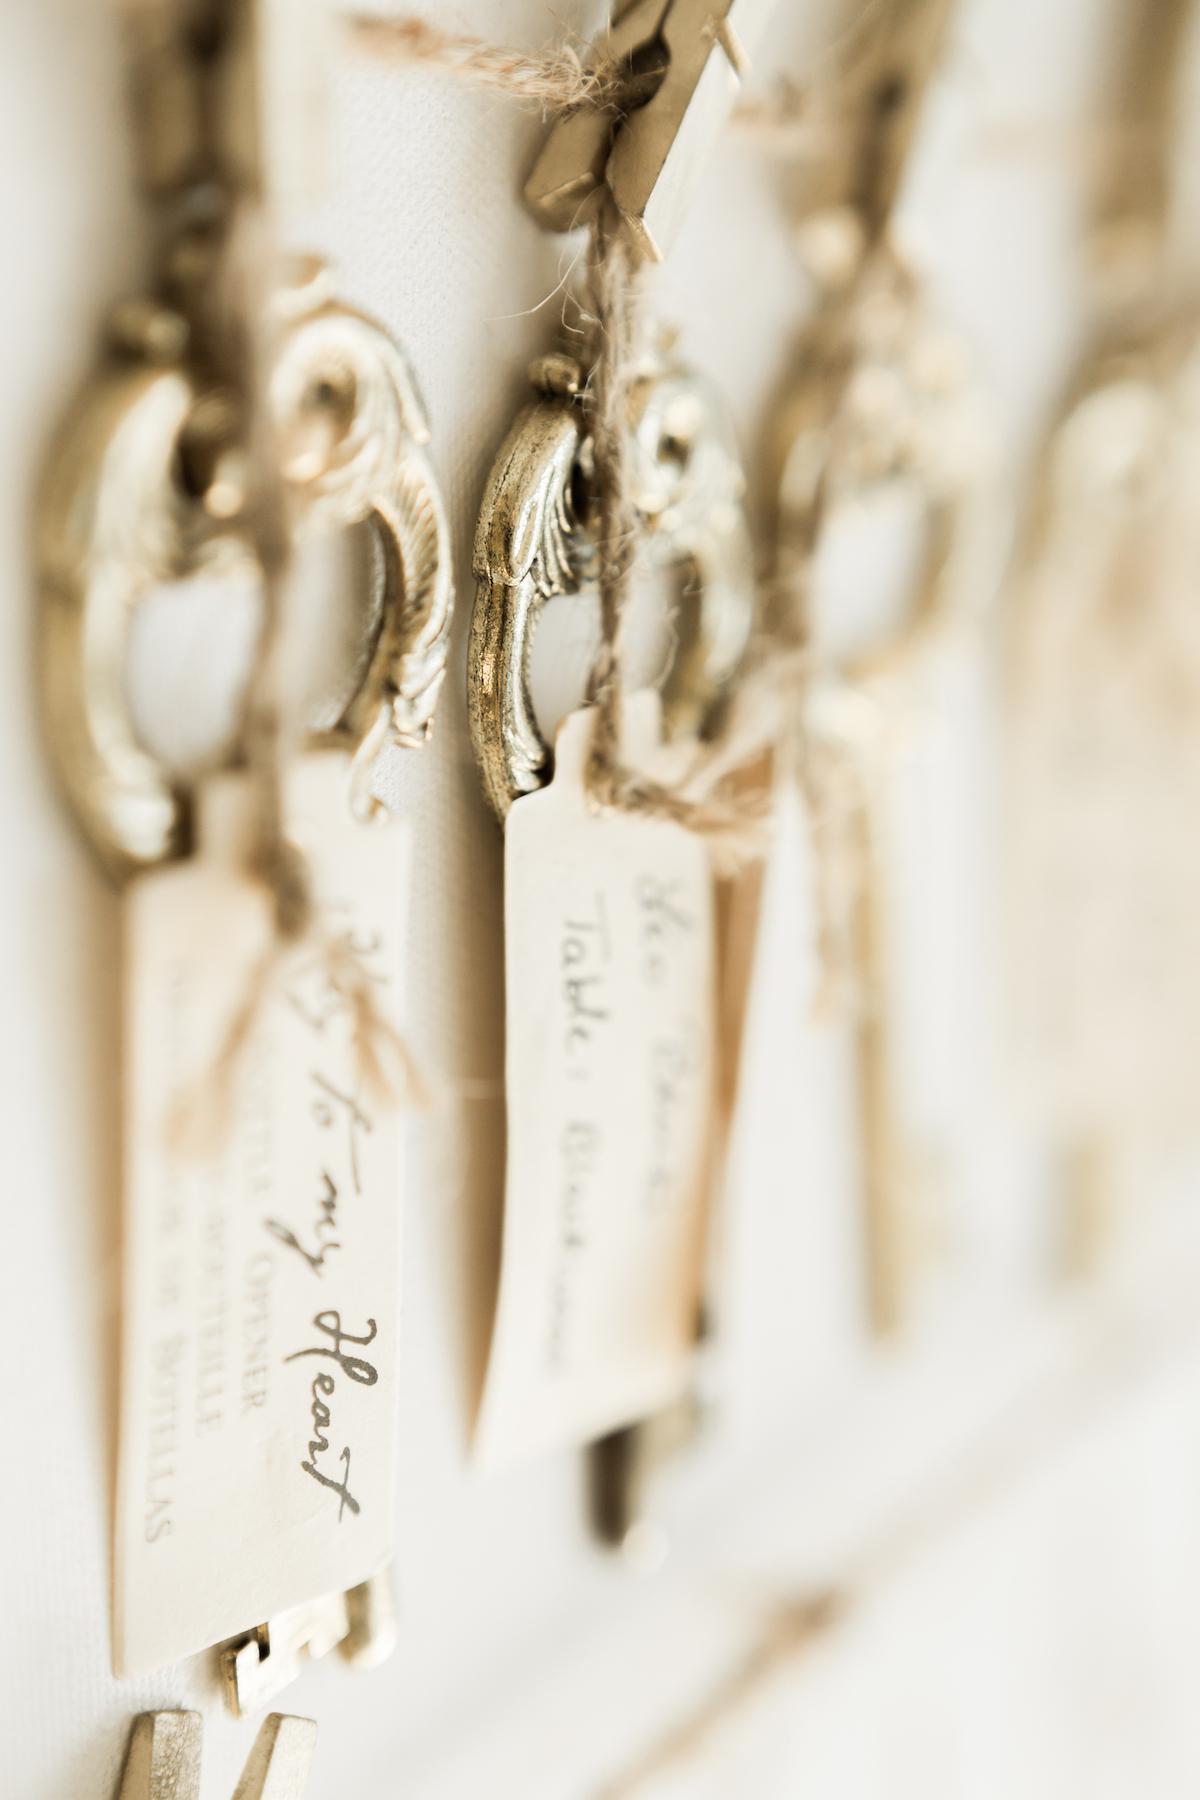 annecy-wedding-photos-179.jpg